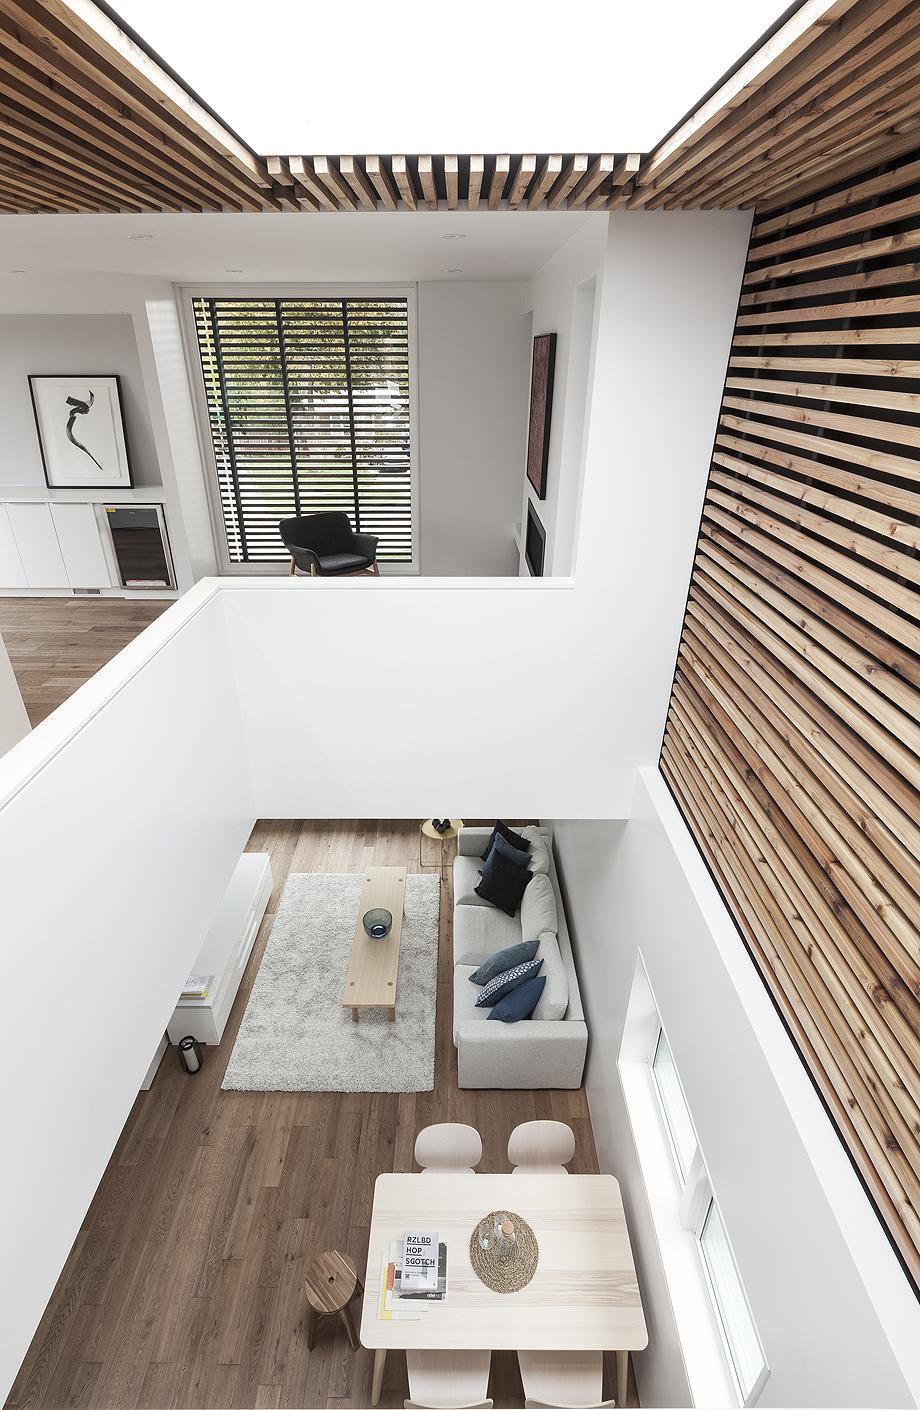 La Casa Volteada Del Arquitecto Reza Aliabadi # Muebles Pepe Jesus Vecindario